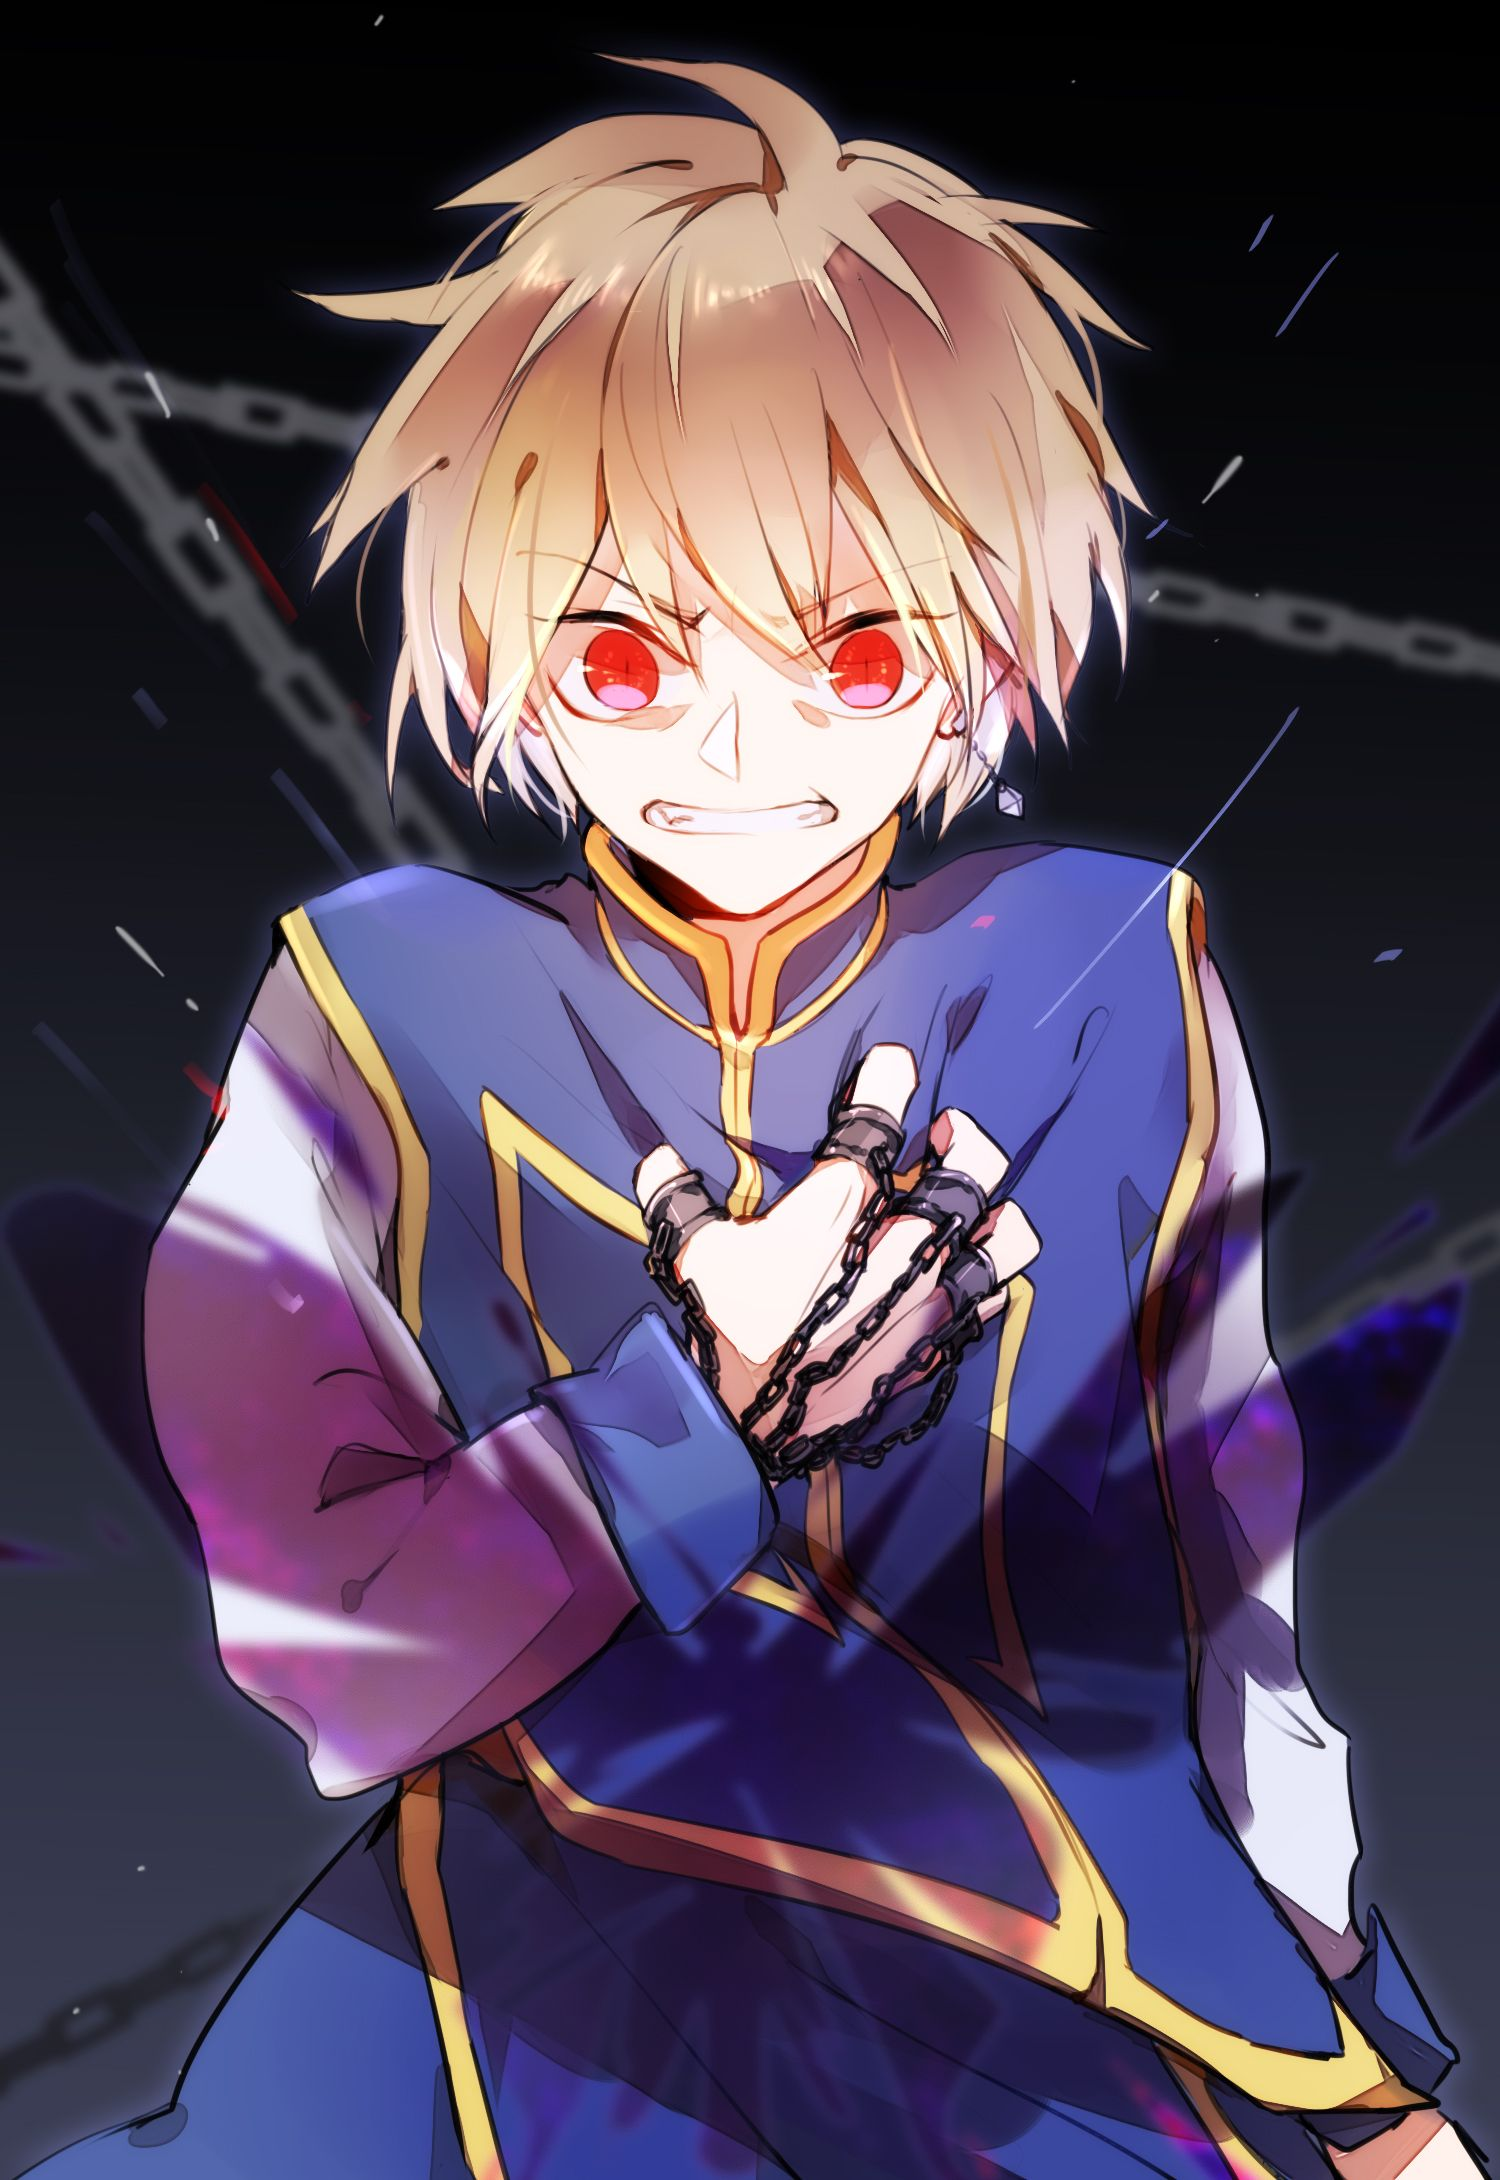 Image by Joud on Kurapika Hunter x hunter, Hunter, Anime